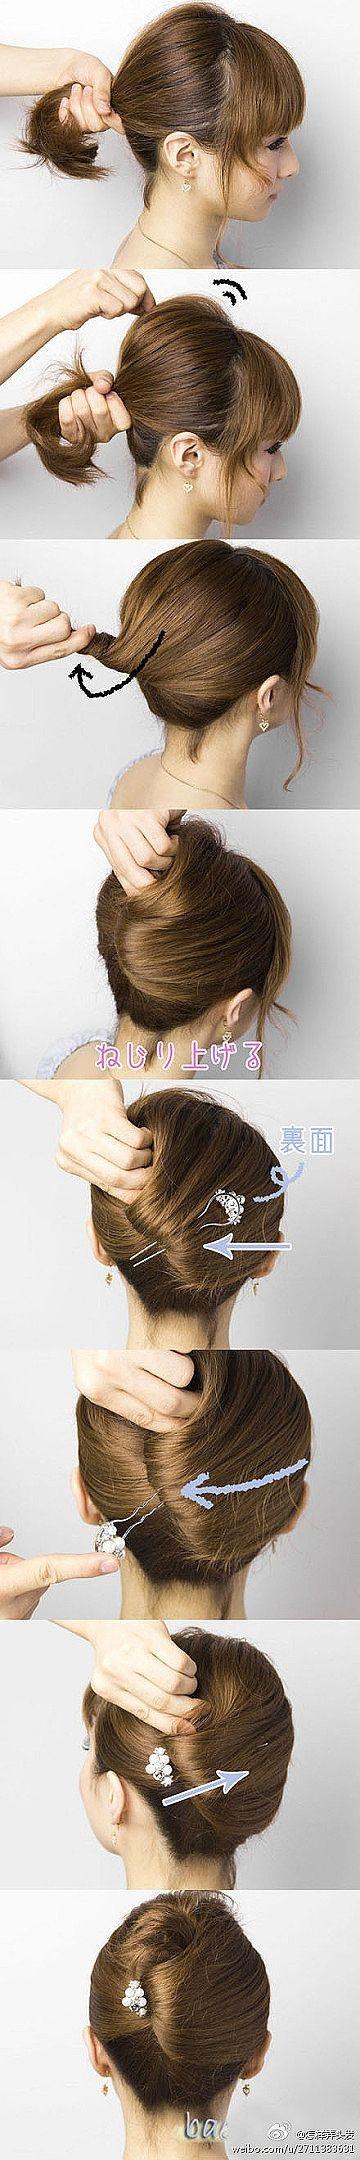 el pelo-corto-3